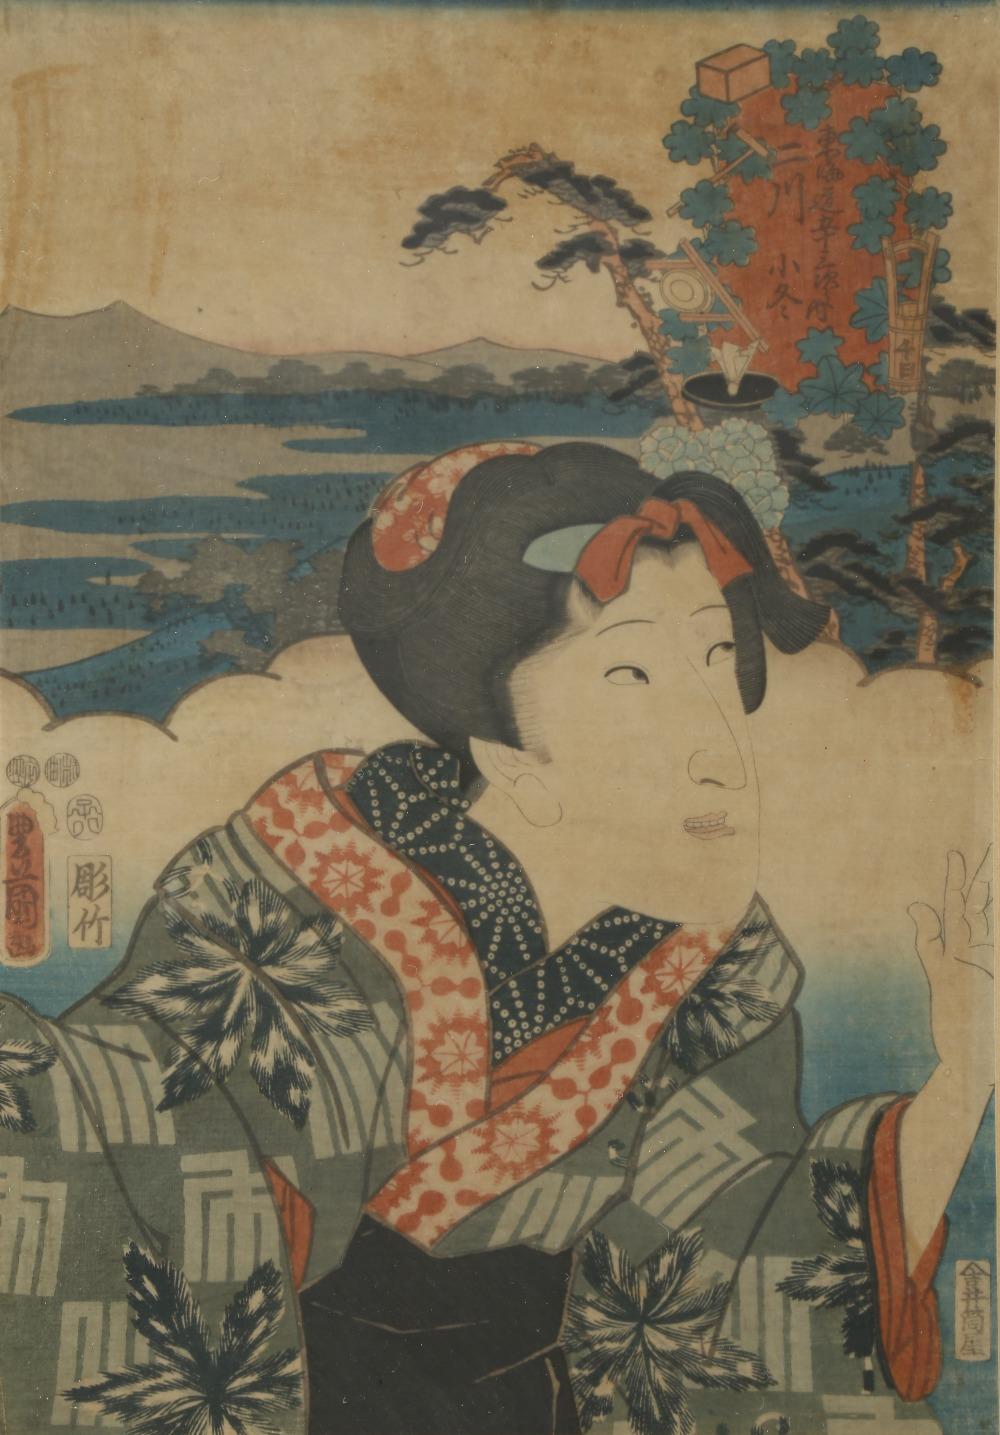 A COLLECTION OF TWELVE JAPANESE WOODBLOCK PRINTS BY UTAGAWA KUNISADA (1786-1864) MEIJI PERIOD, - Image 9 of 12